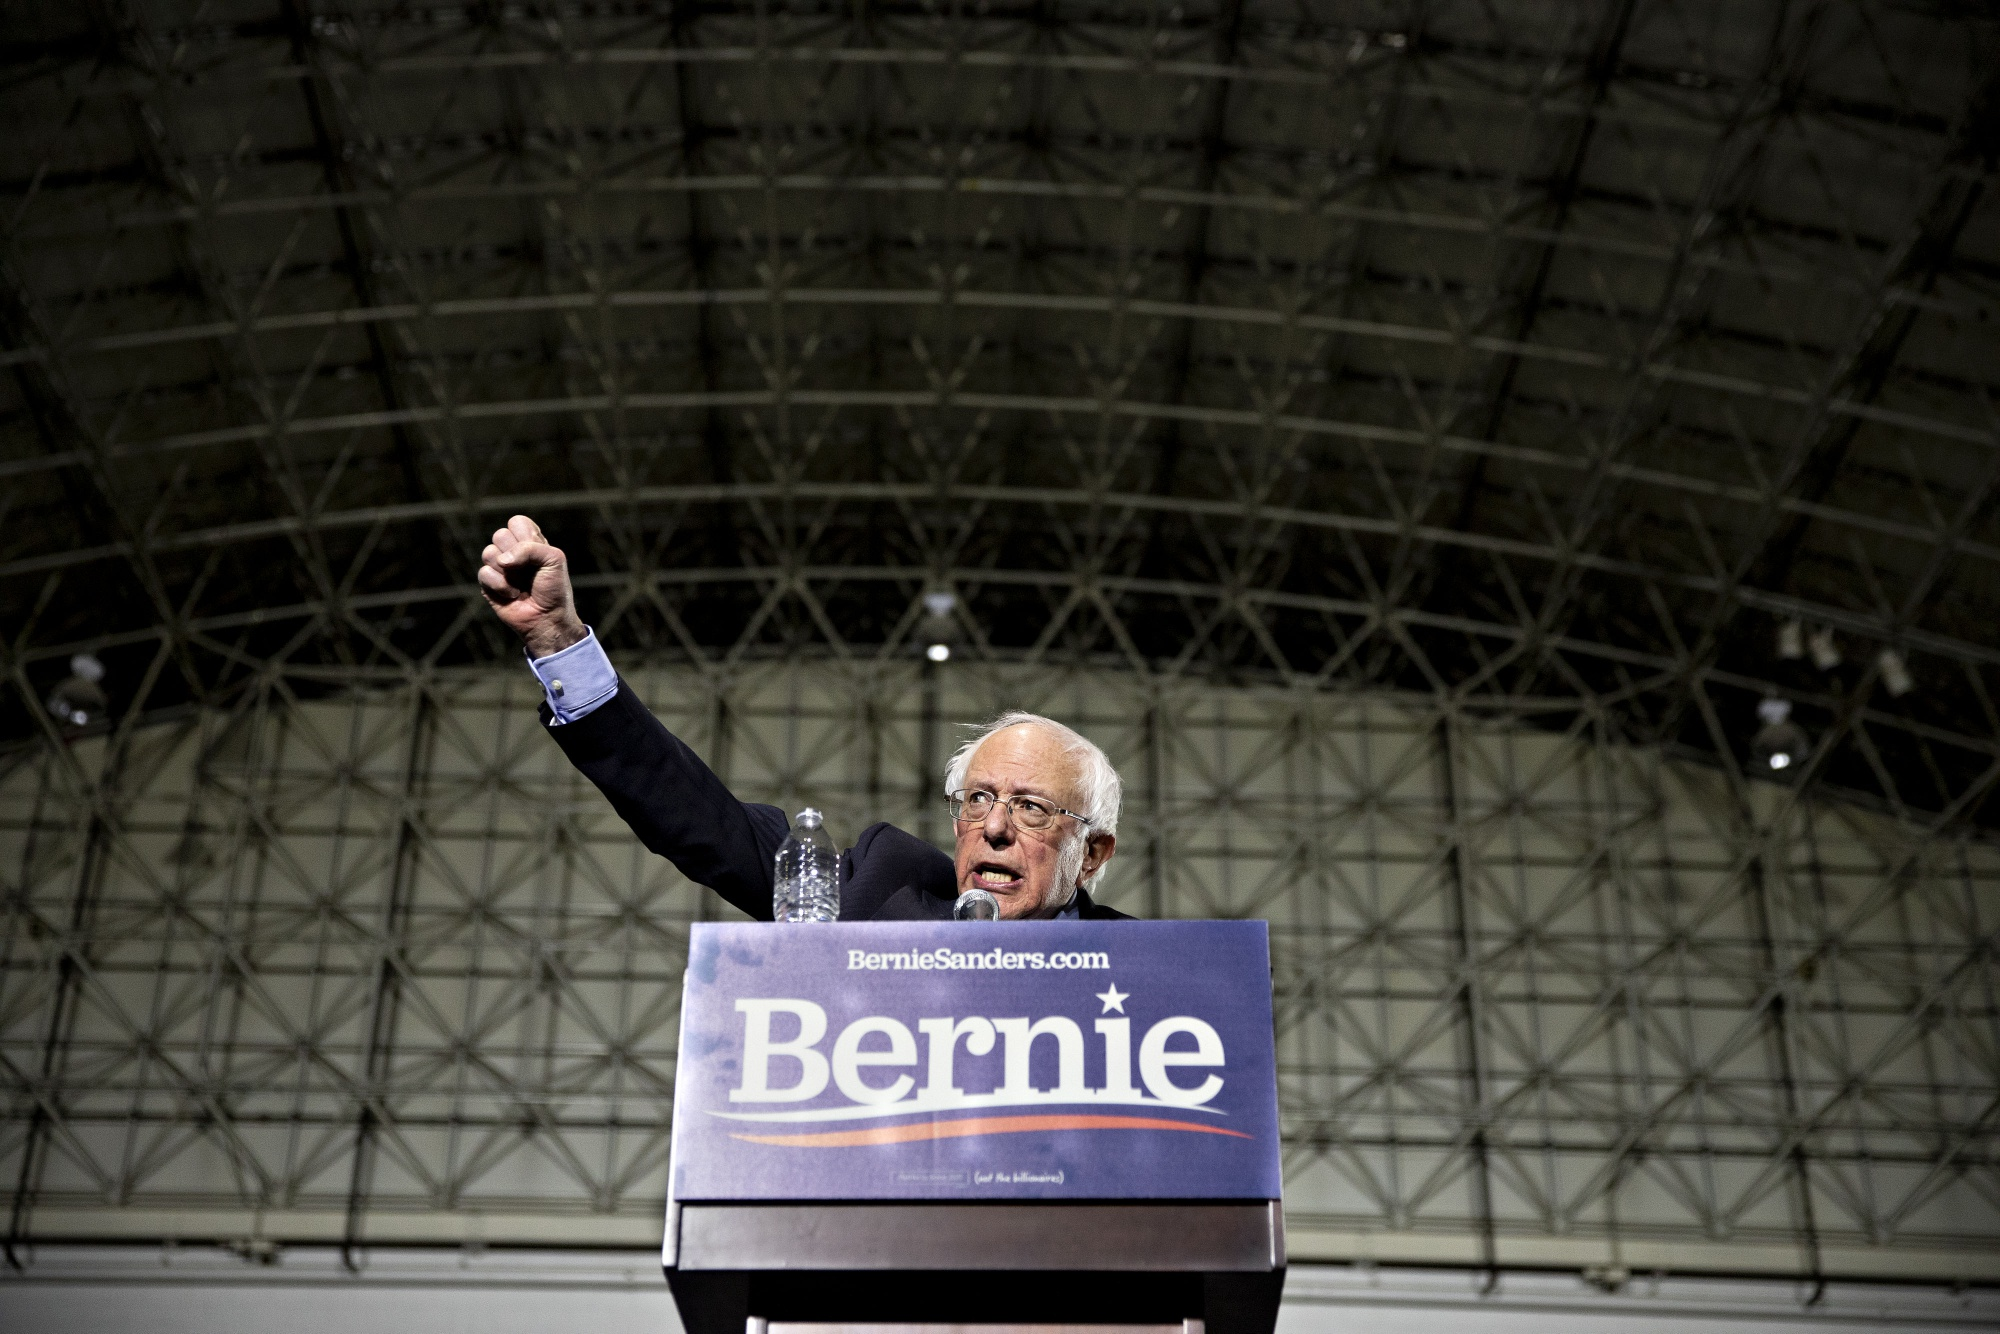 bloomberg.com - Max Nisen - Bernie Sanders, 1; Health Insurers, -$30 Billion